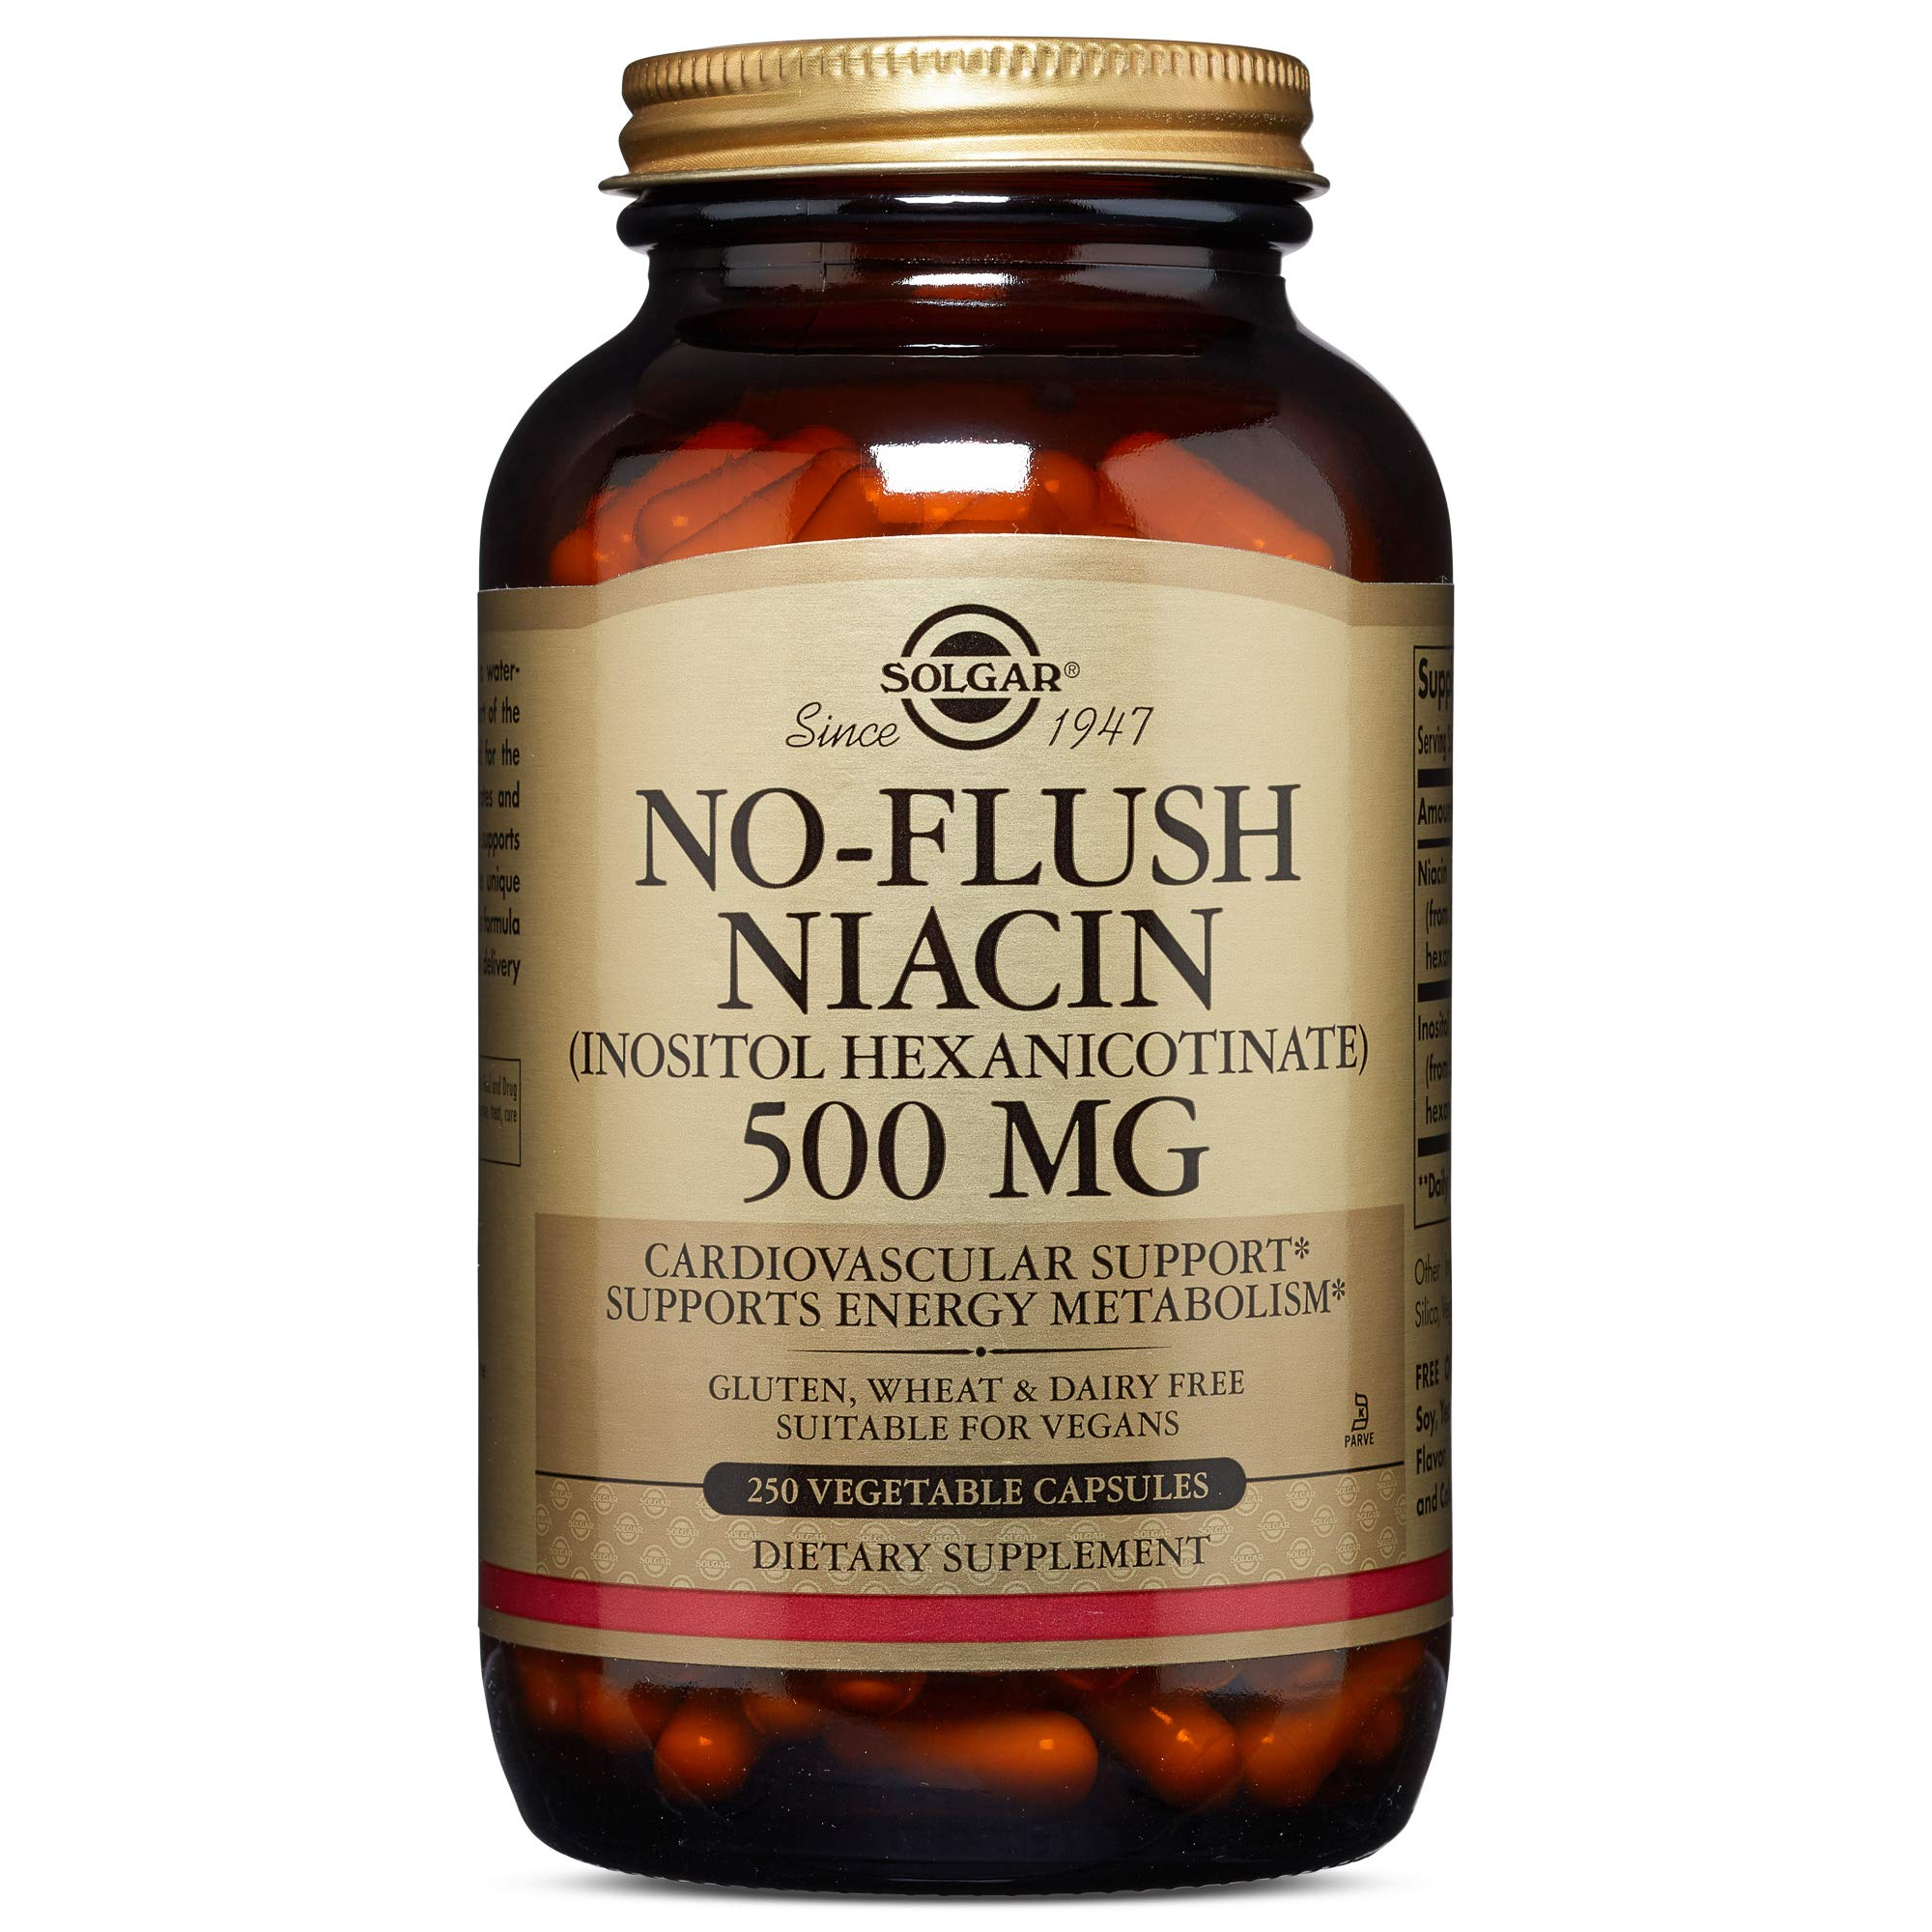 Solgar - No-Flush Niacin (Vitamin B3)(Inositol Hexanicotinate) 500 mg, 250 Vegetable Capsules by Solgar